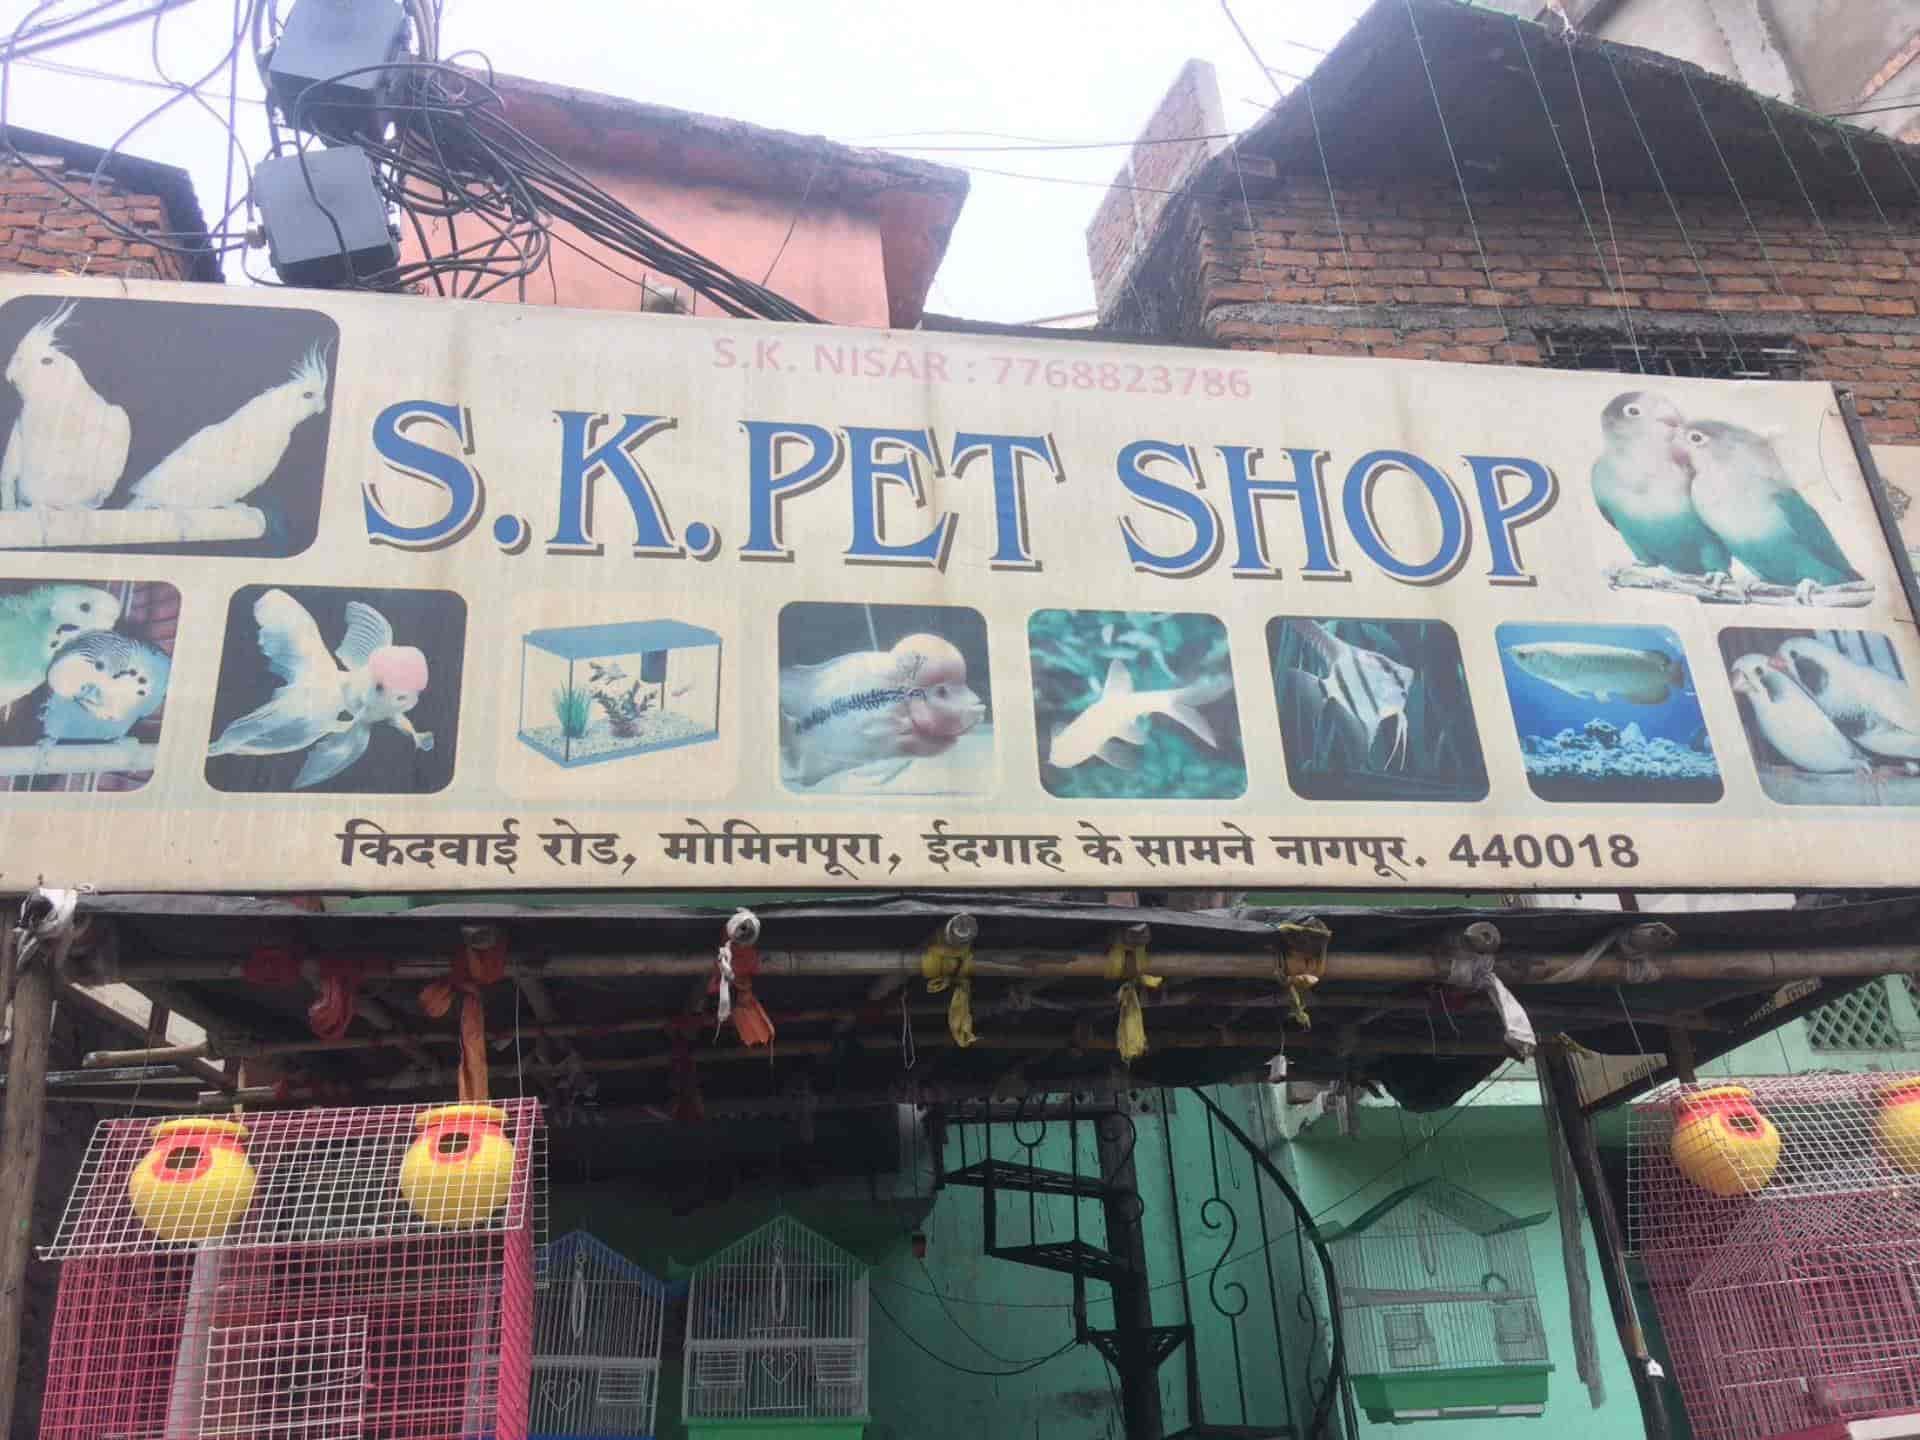 S K Pet & Fish Food Supplier, Mominpura - Pet Shops in